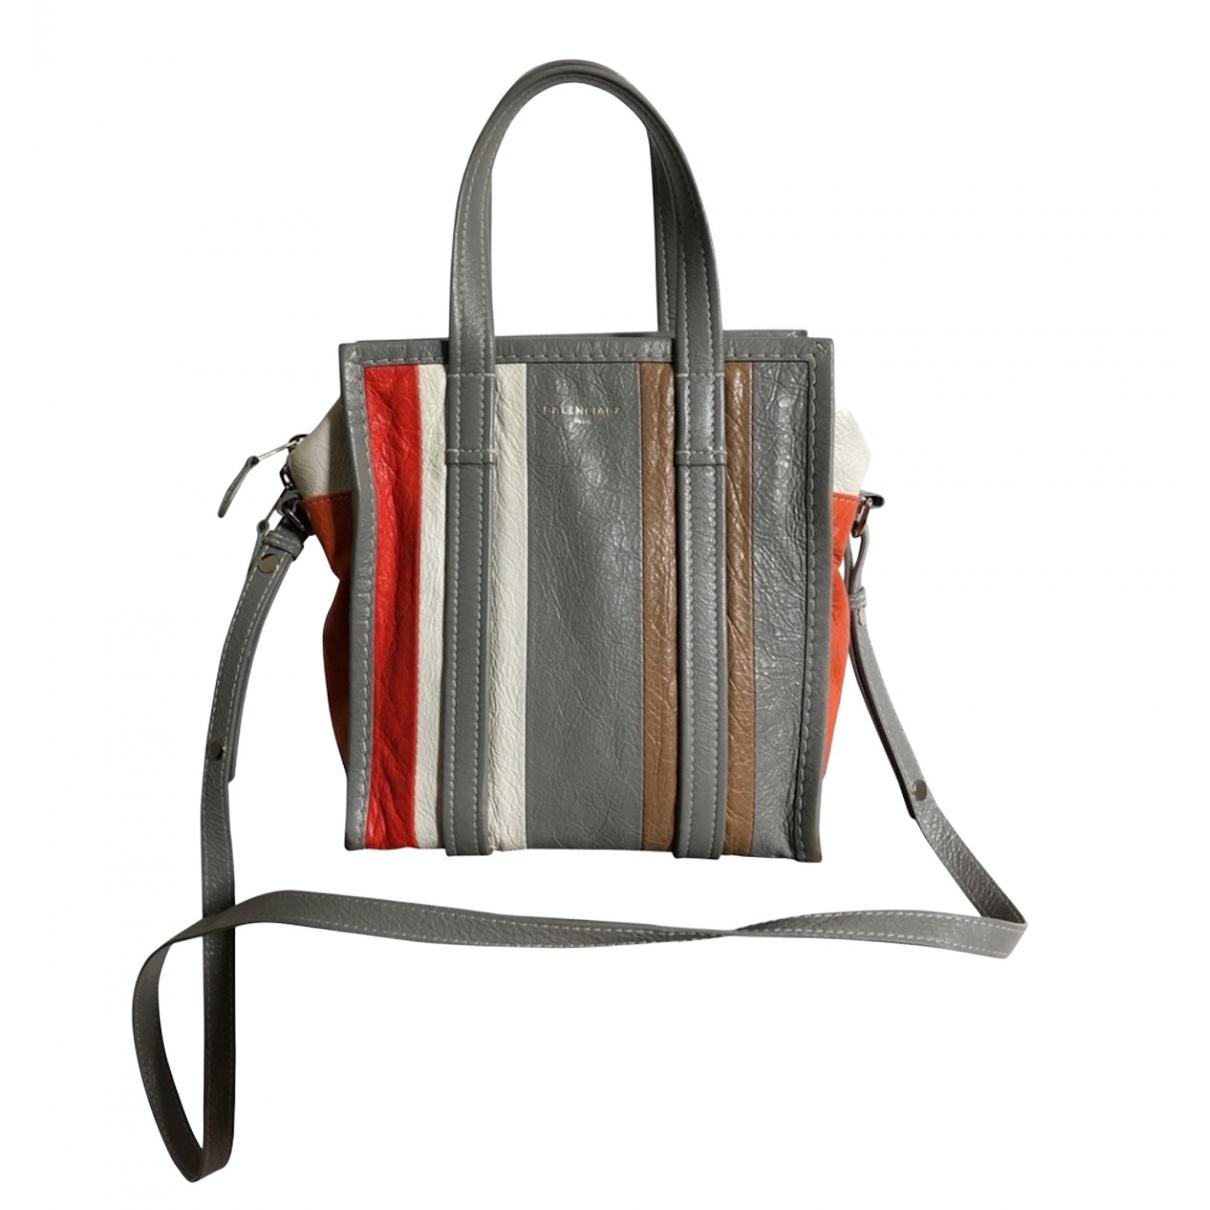 Cabas Bazar Bag de Cuero Balenciaga